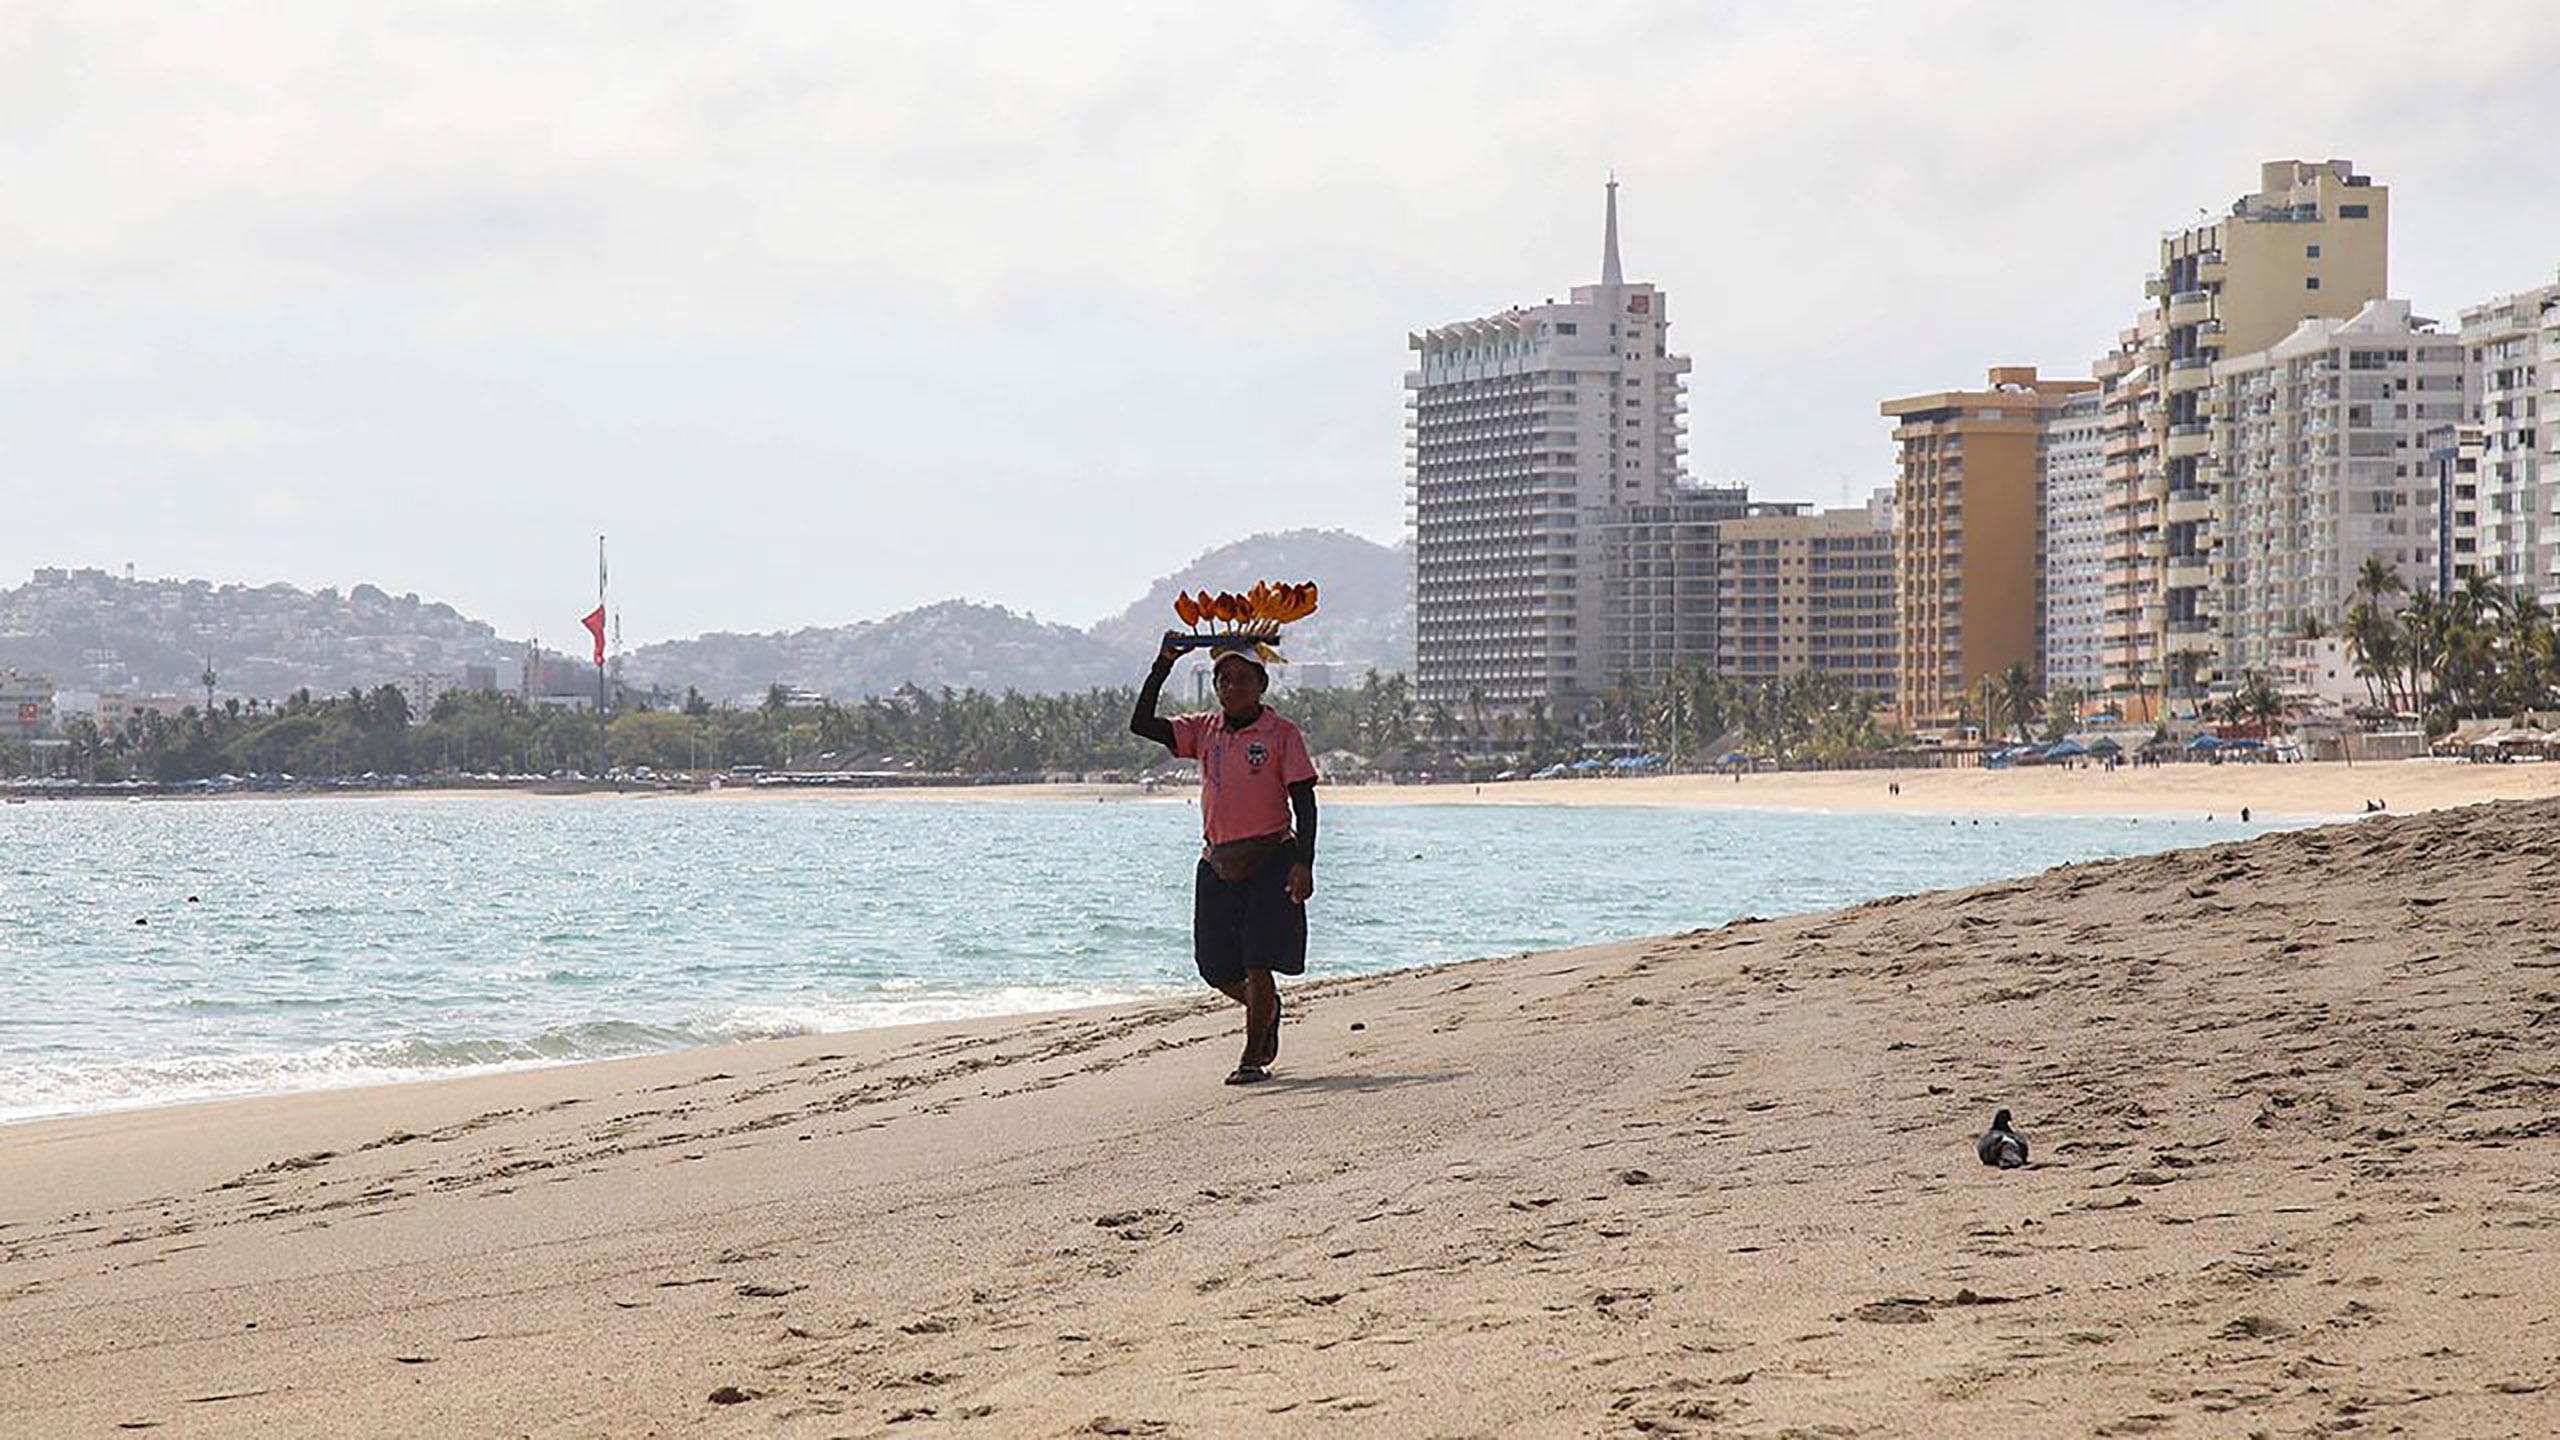 playa, playa de Guerrero